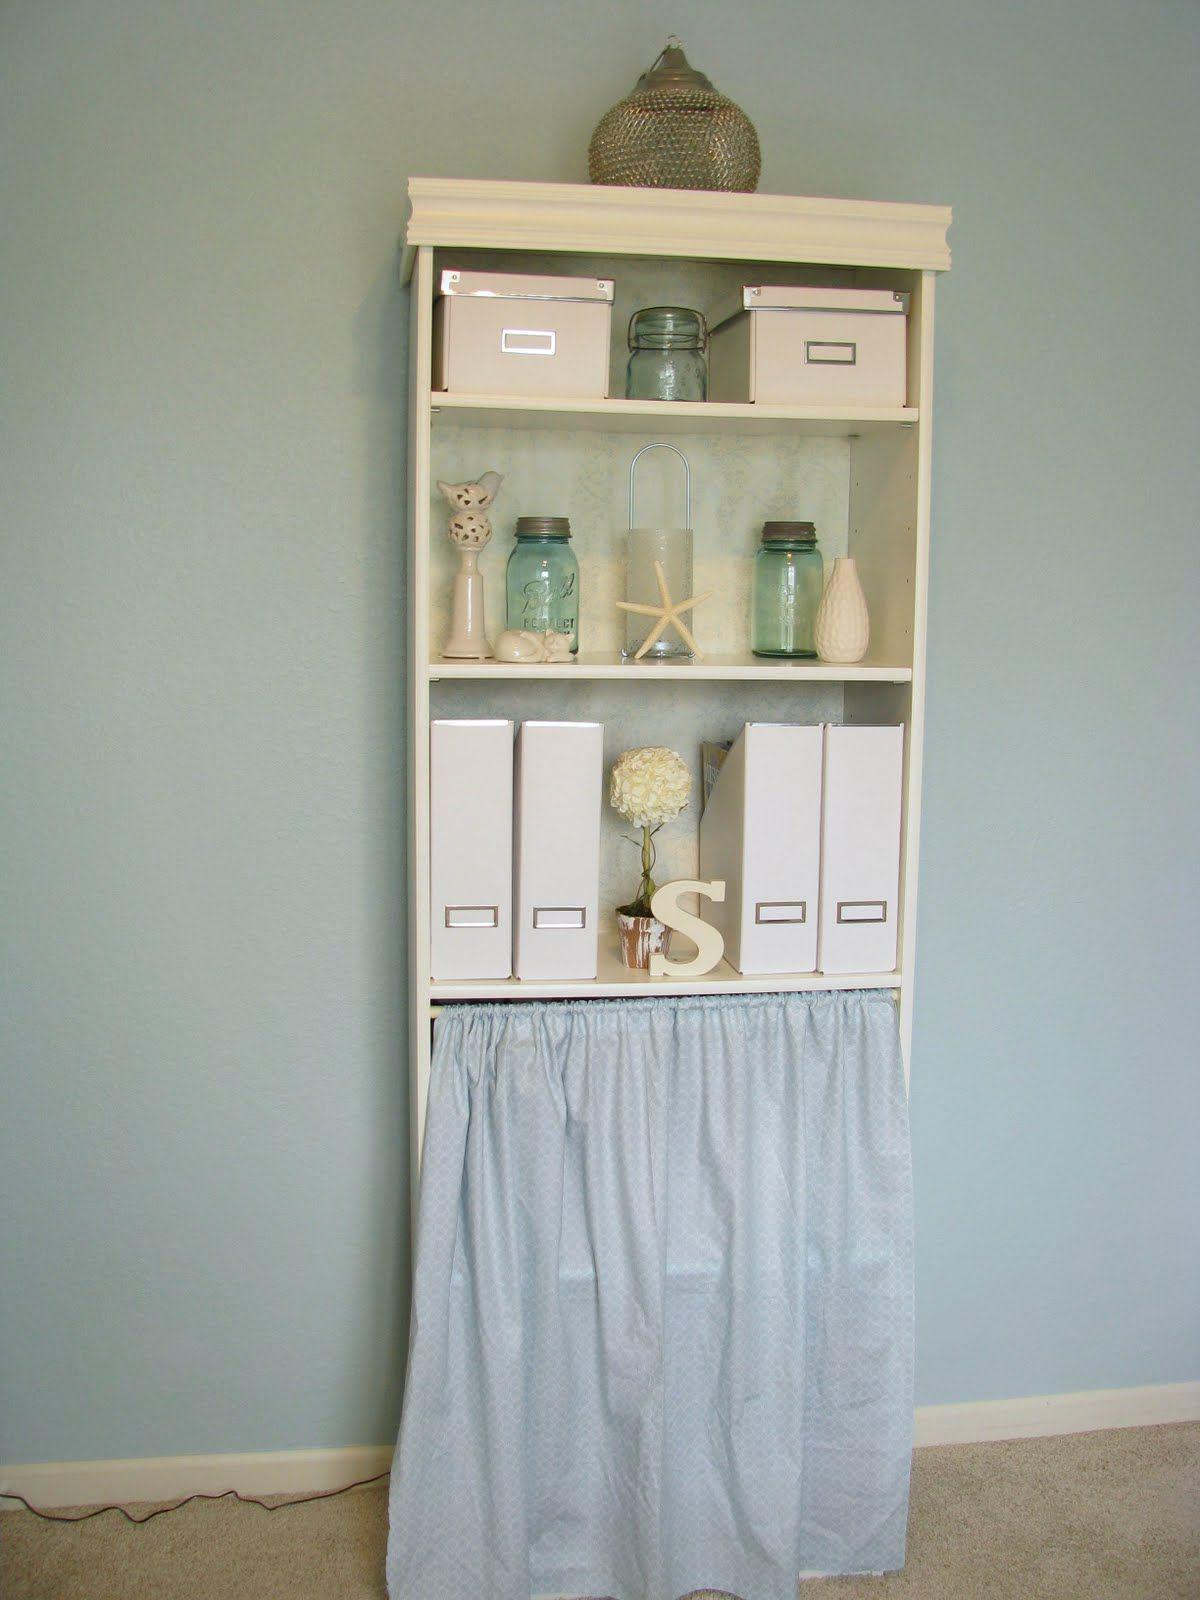 cheap laminate bookcase makeover idea sand prime paint add